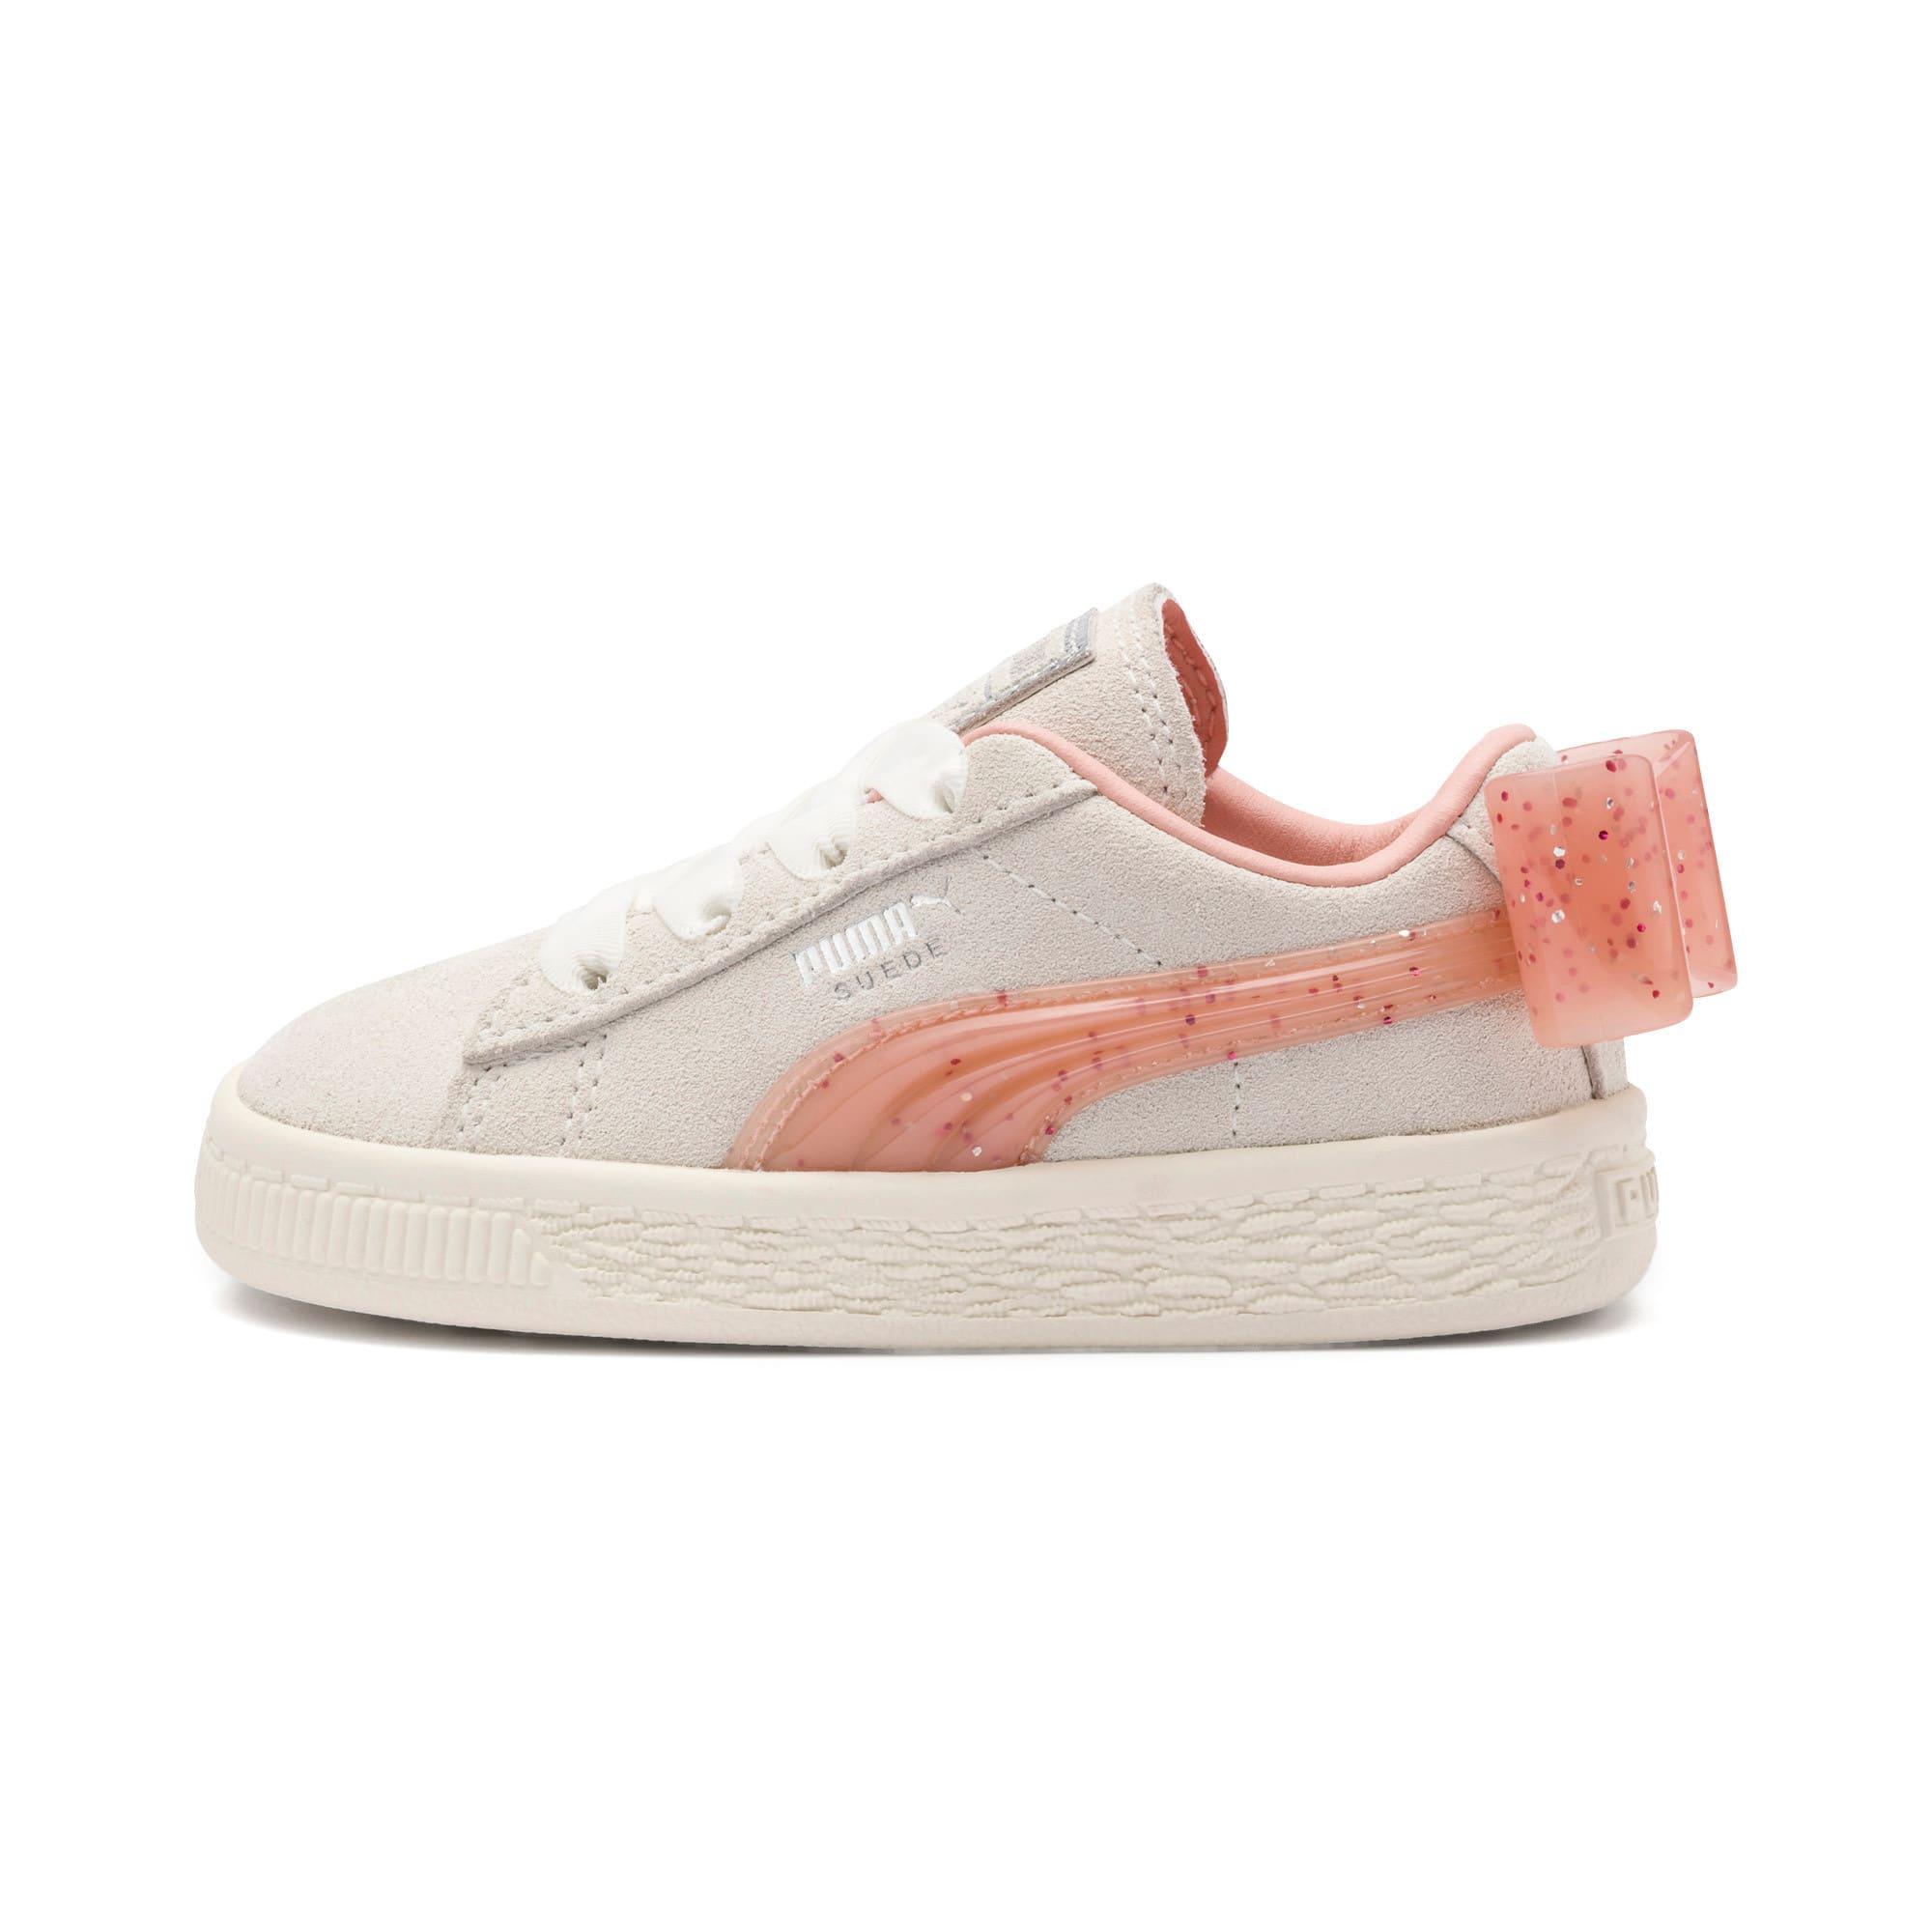 Miniatura 1 de Zapatos Suede Jelly Bow AC para niños, Whis White-Peach Bud-Silver, mediano